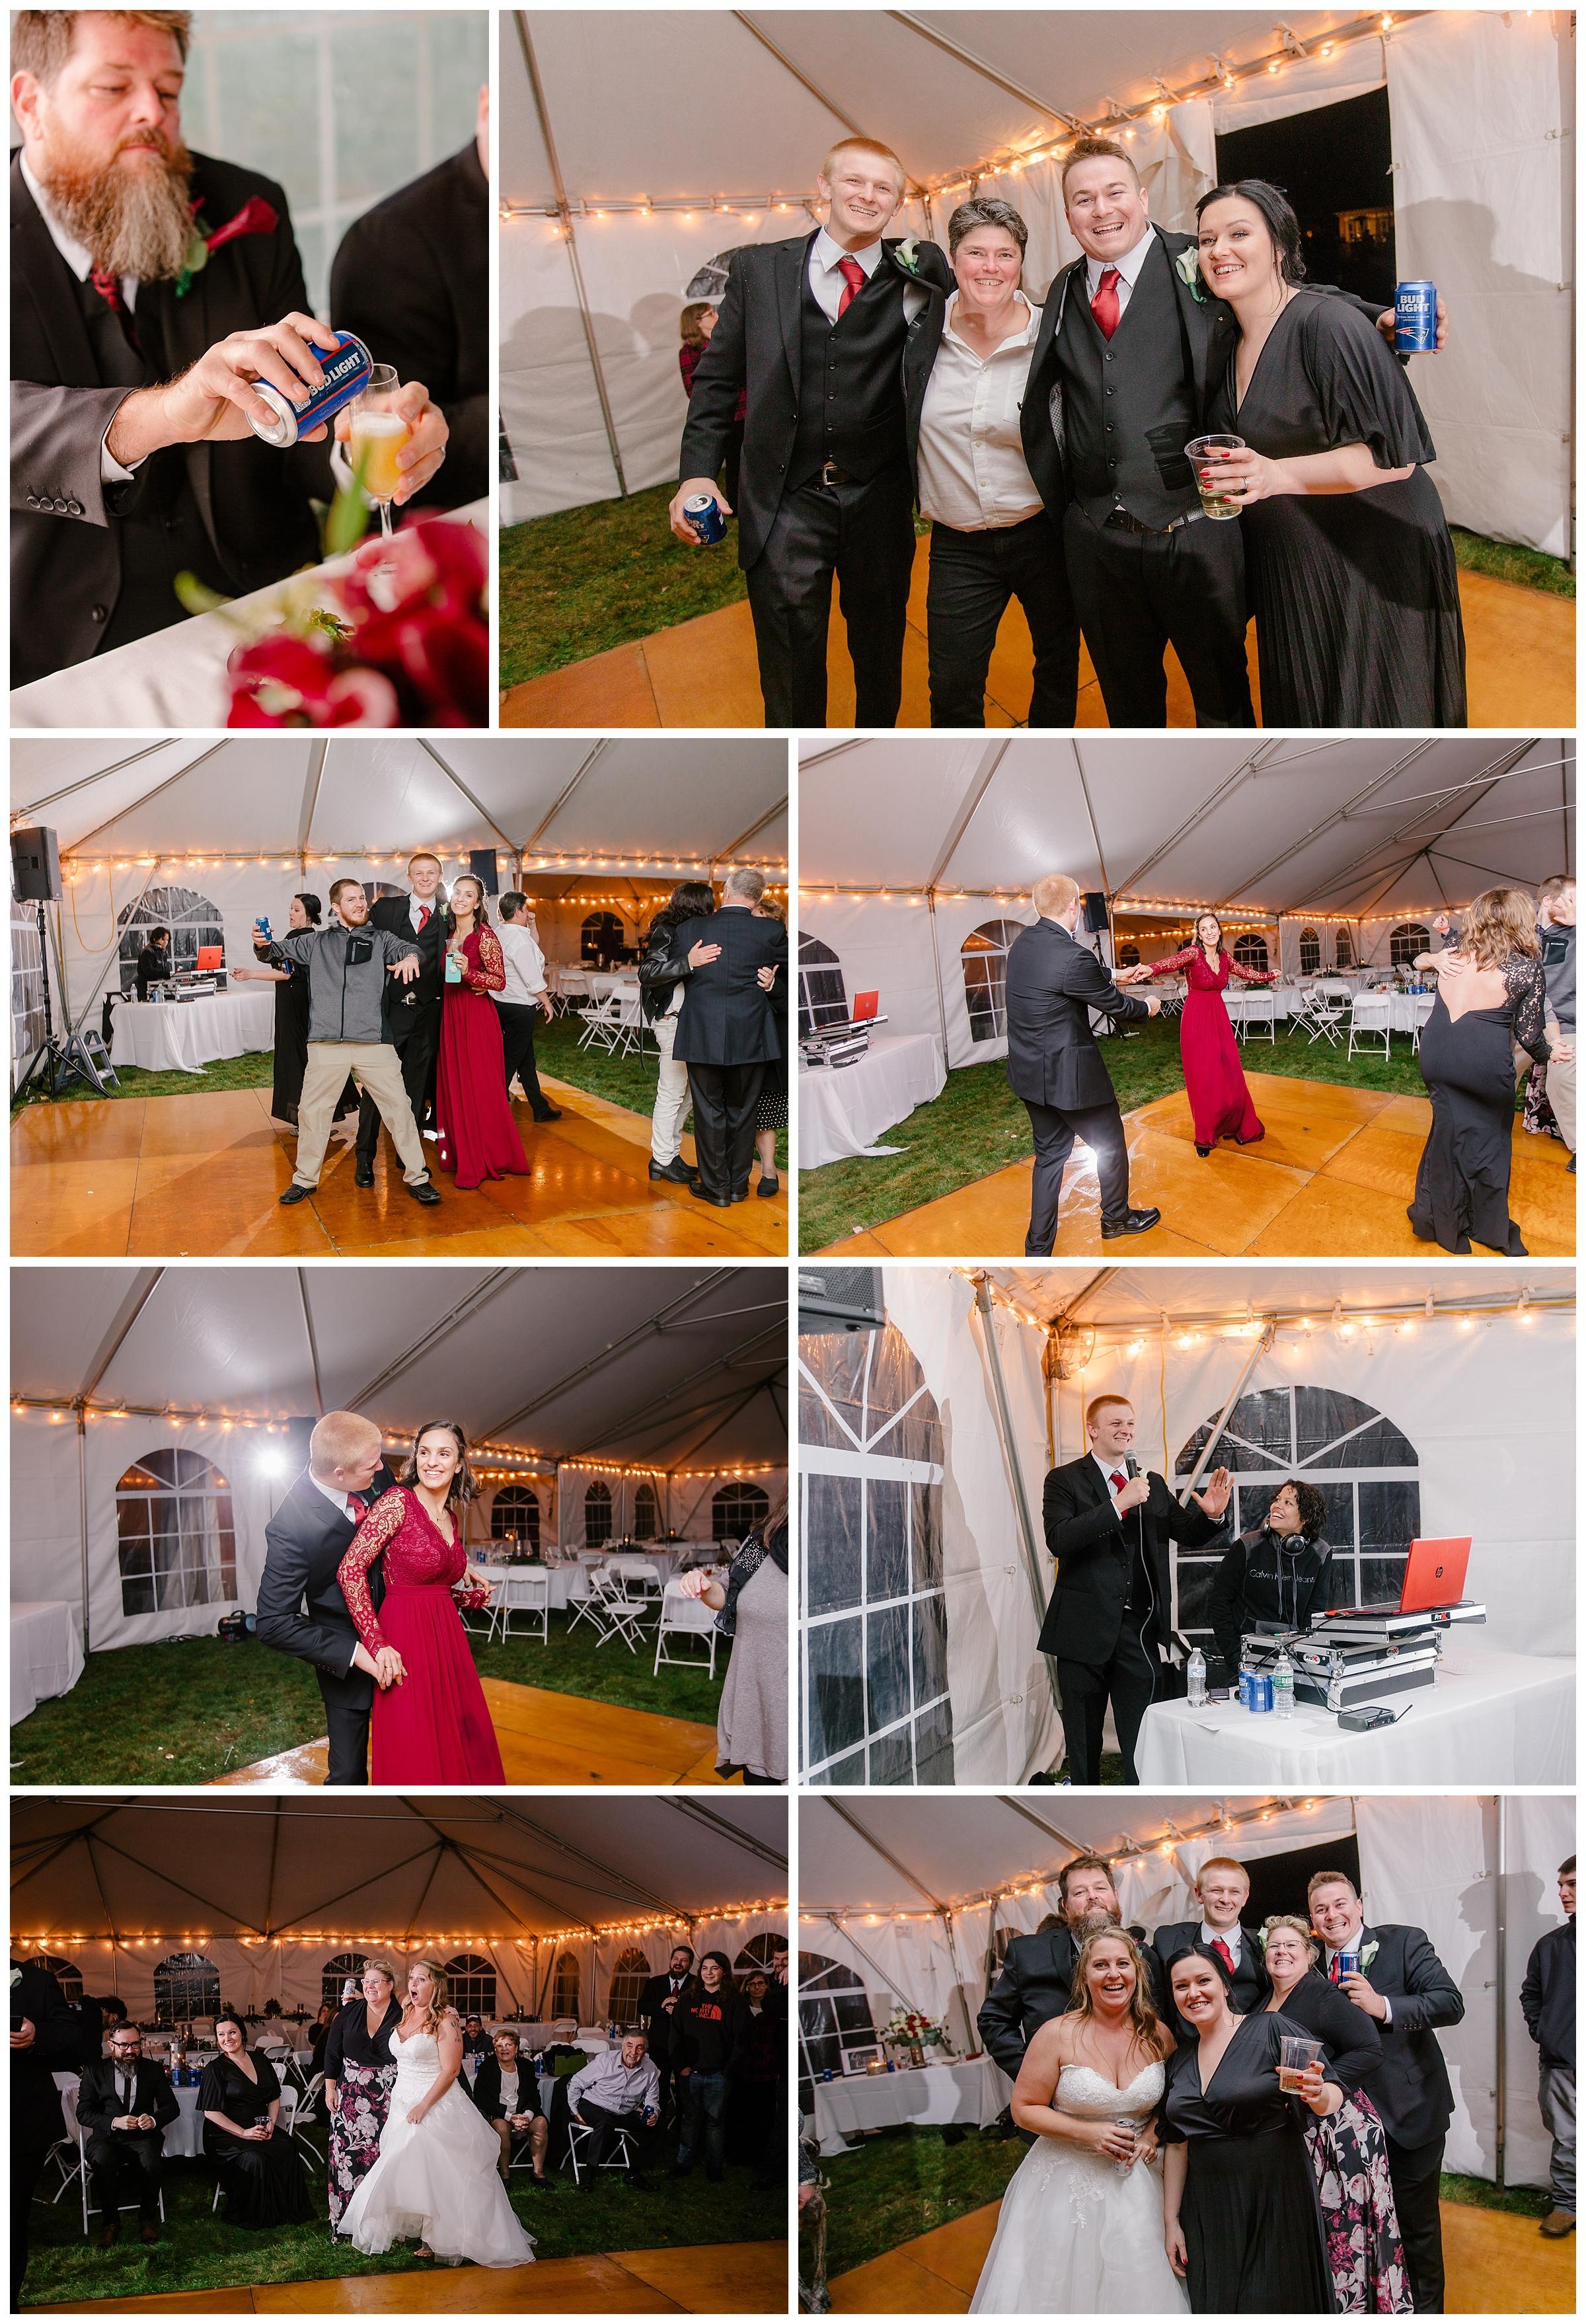 #atlast,#peard,Artistic,Autumn,BLM,Backyard wedding,Candid,Creative,Emily Barthel,Emma Barthel,Emma-John-Wedding,Fall,Fall Wedding,Great Road,Jaffrey,Jaffrey Wedding Photographer,John Peard,John Peard Jr,Mt. Monadnock,NH,NH Wedding,NH Wedding Photographer,Natural,New England,New England Wedding,New Hampshire,New Hampshire Wedding Photographer,Oct,October,Photo,Photographer,Photography,Photojournalistic,Private Venue,Professional,Professional Wedding Photography,Vivid,Wedding,Wedding Photography,Wedding Photography Packages,www.blmphoto.com,©BLM Photography 2018,